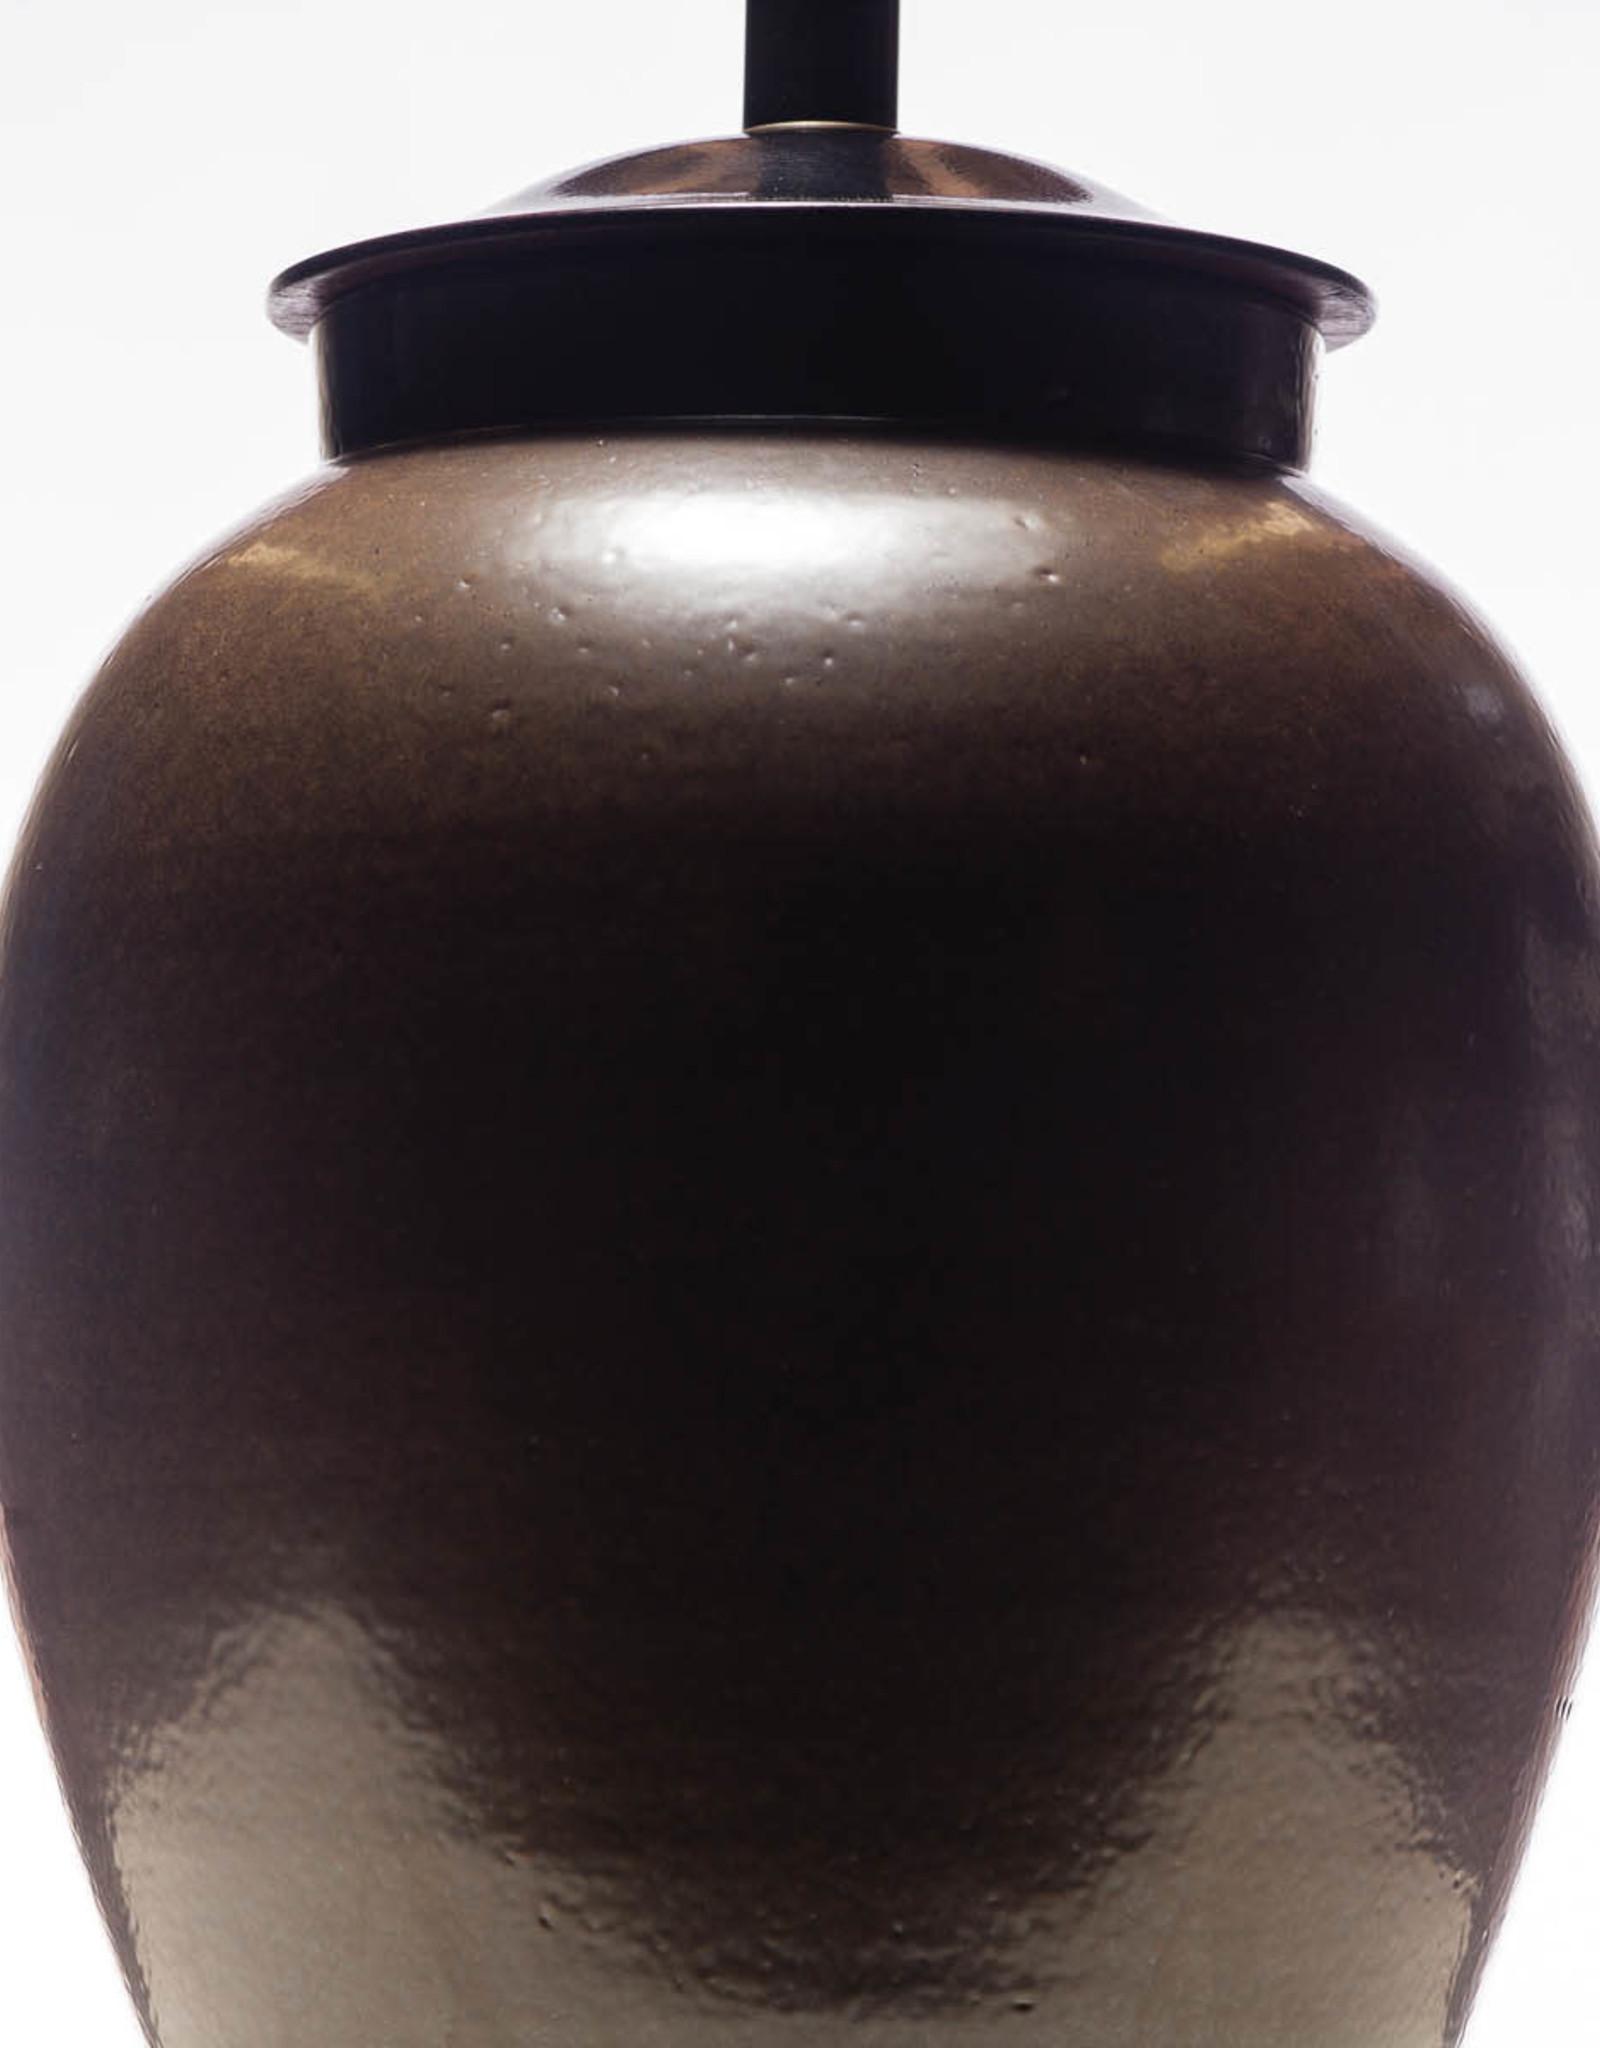 Lawrence & Scott Legacy Sybil Porcelain Latte Lamp, Brown Glaze